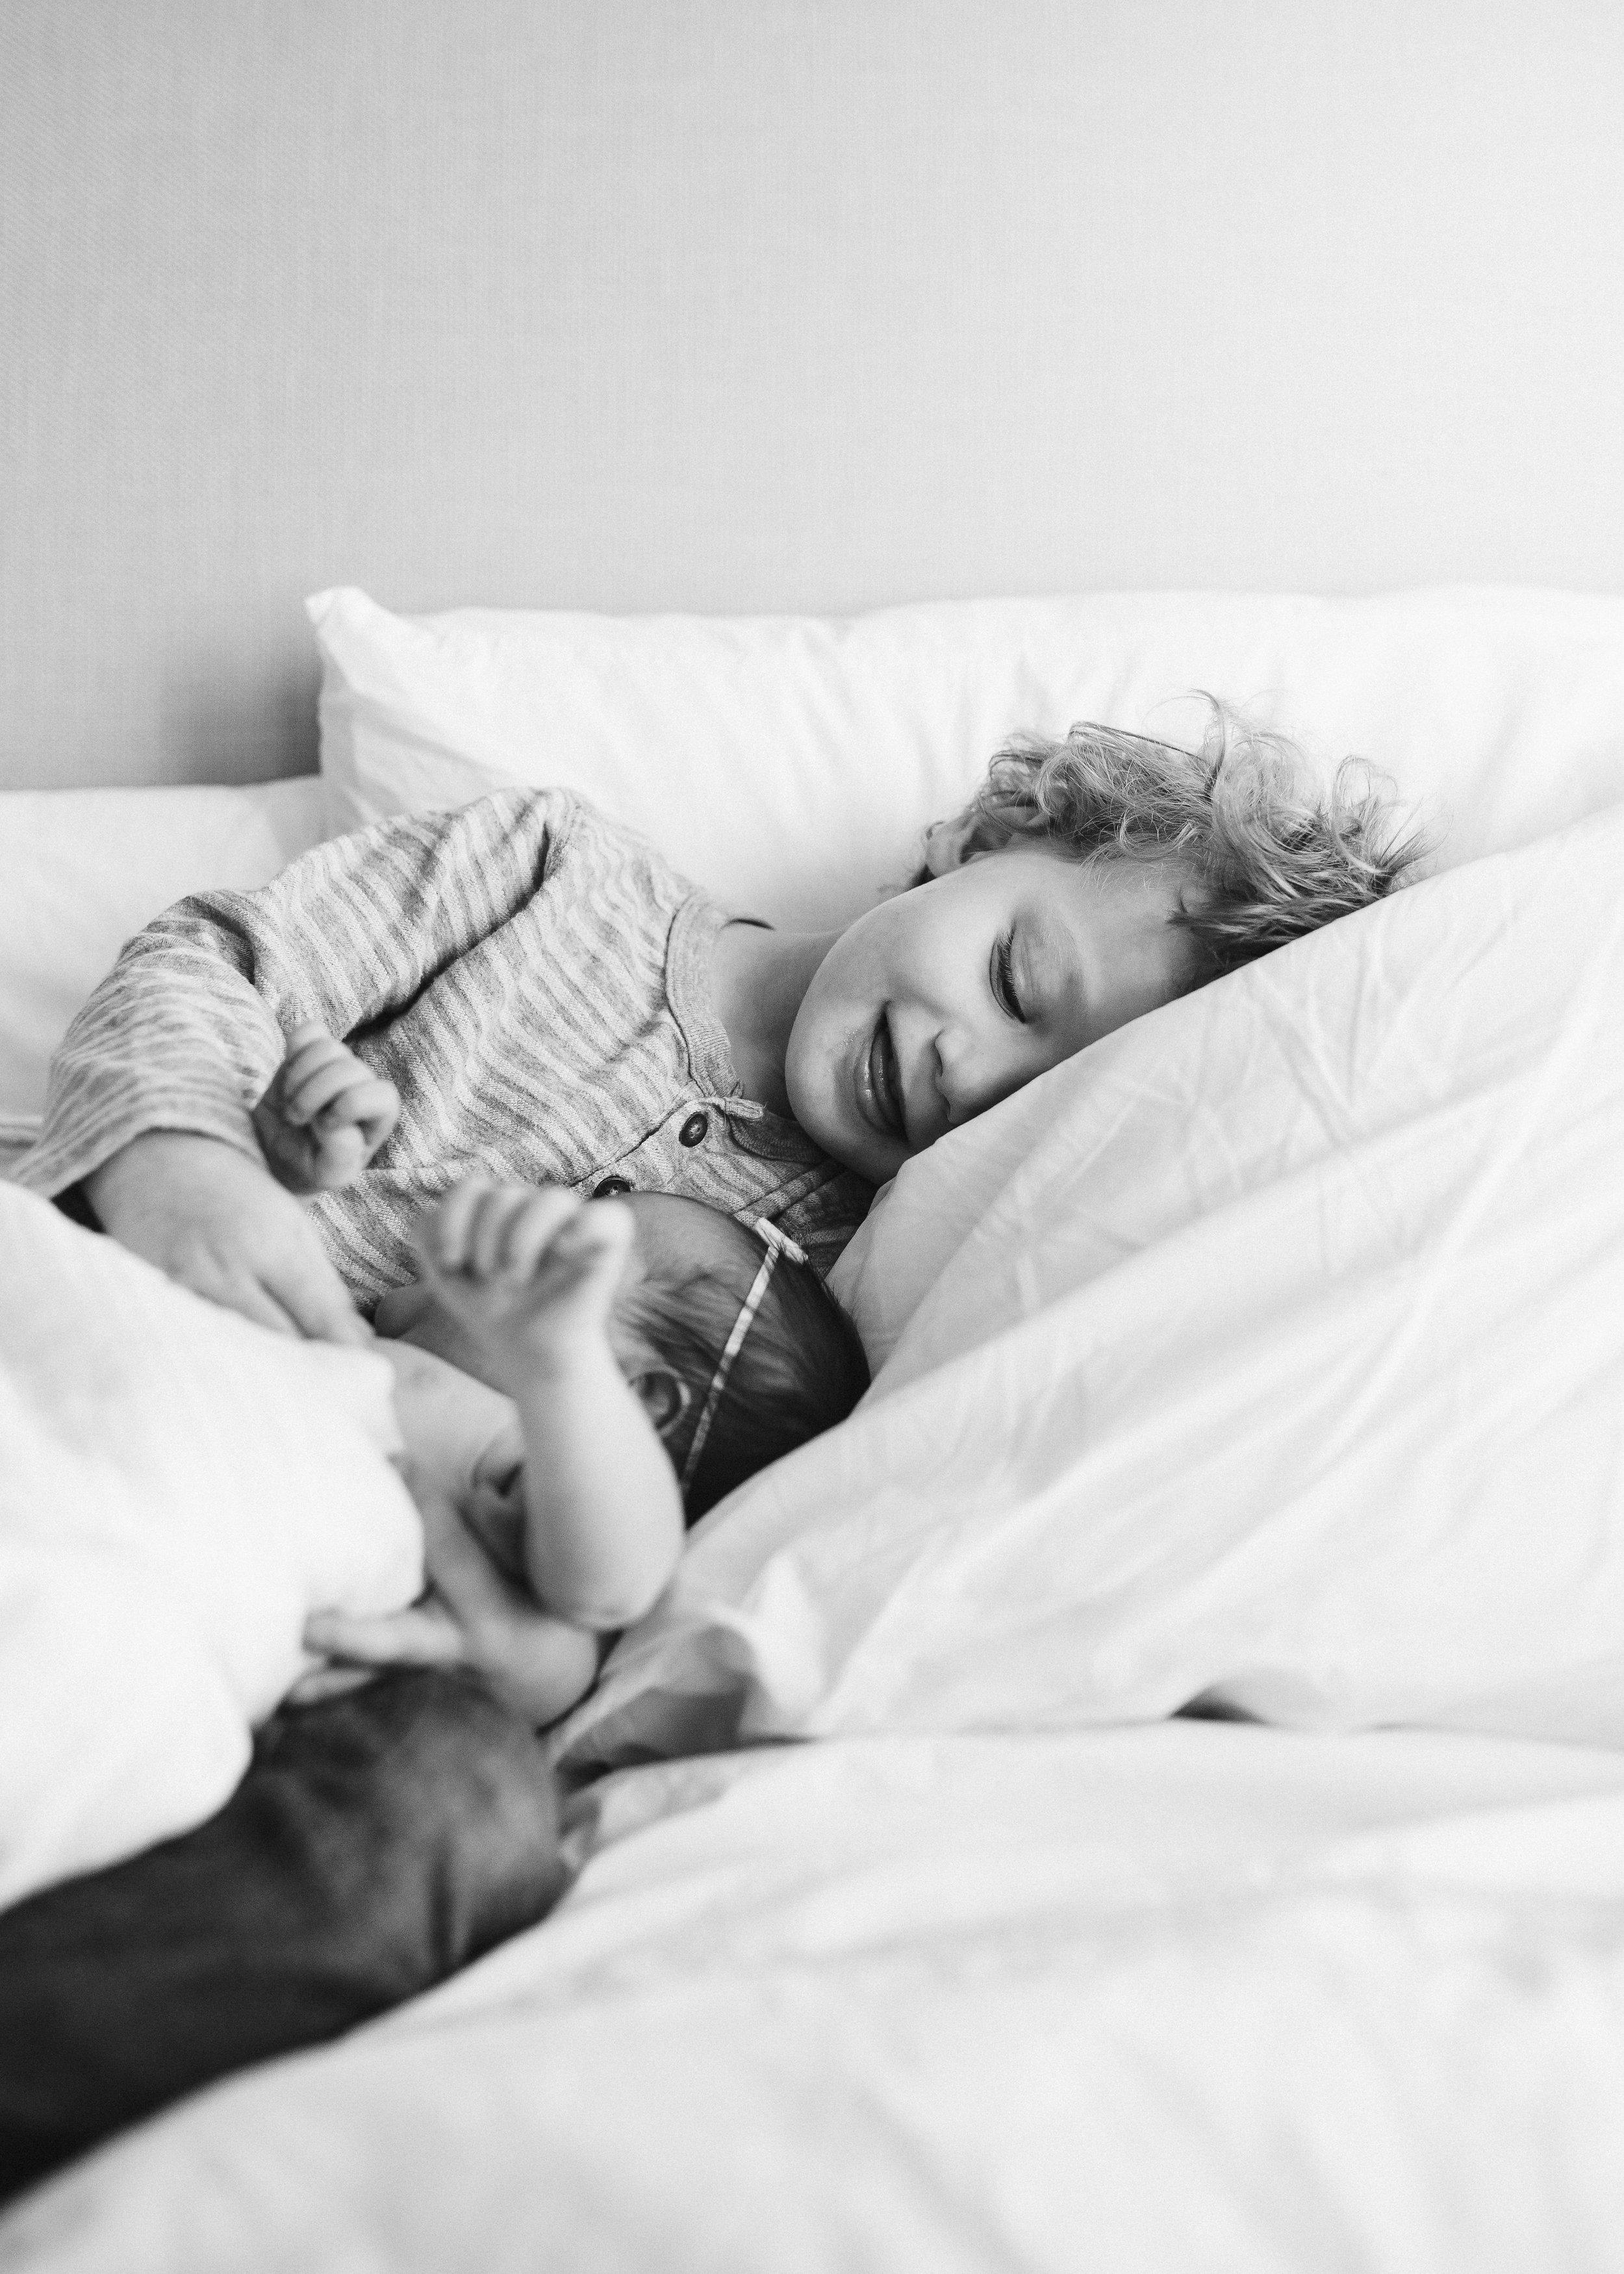 verbuch-family_brooklyn-ny-newborn-photography-8.jpg